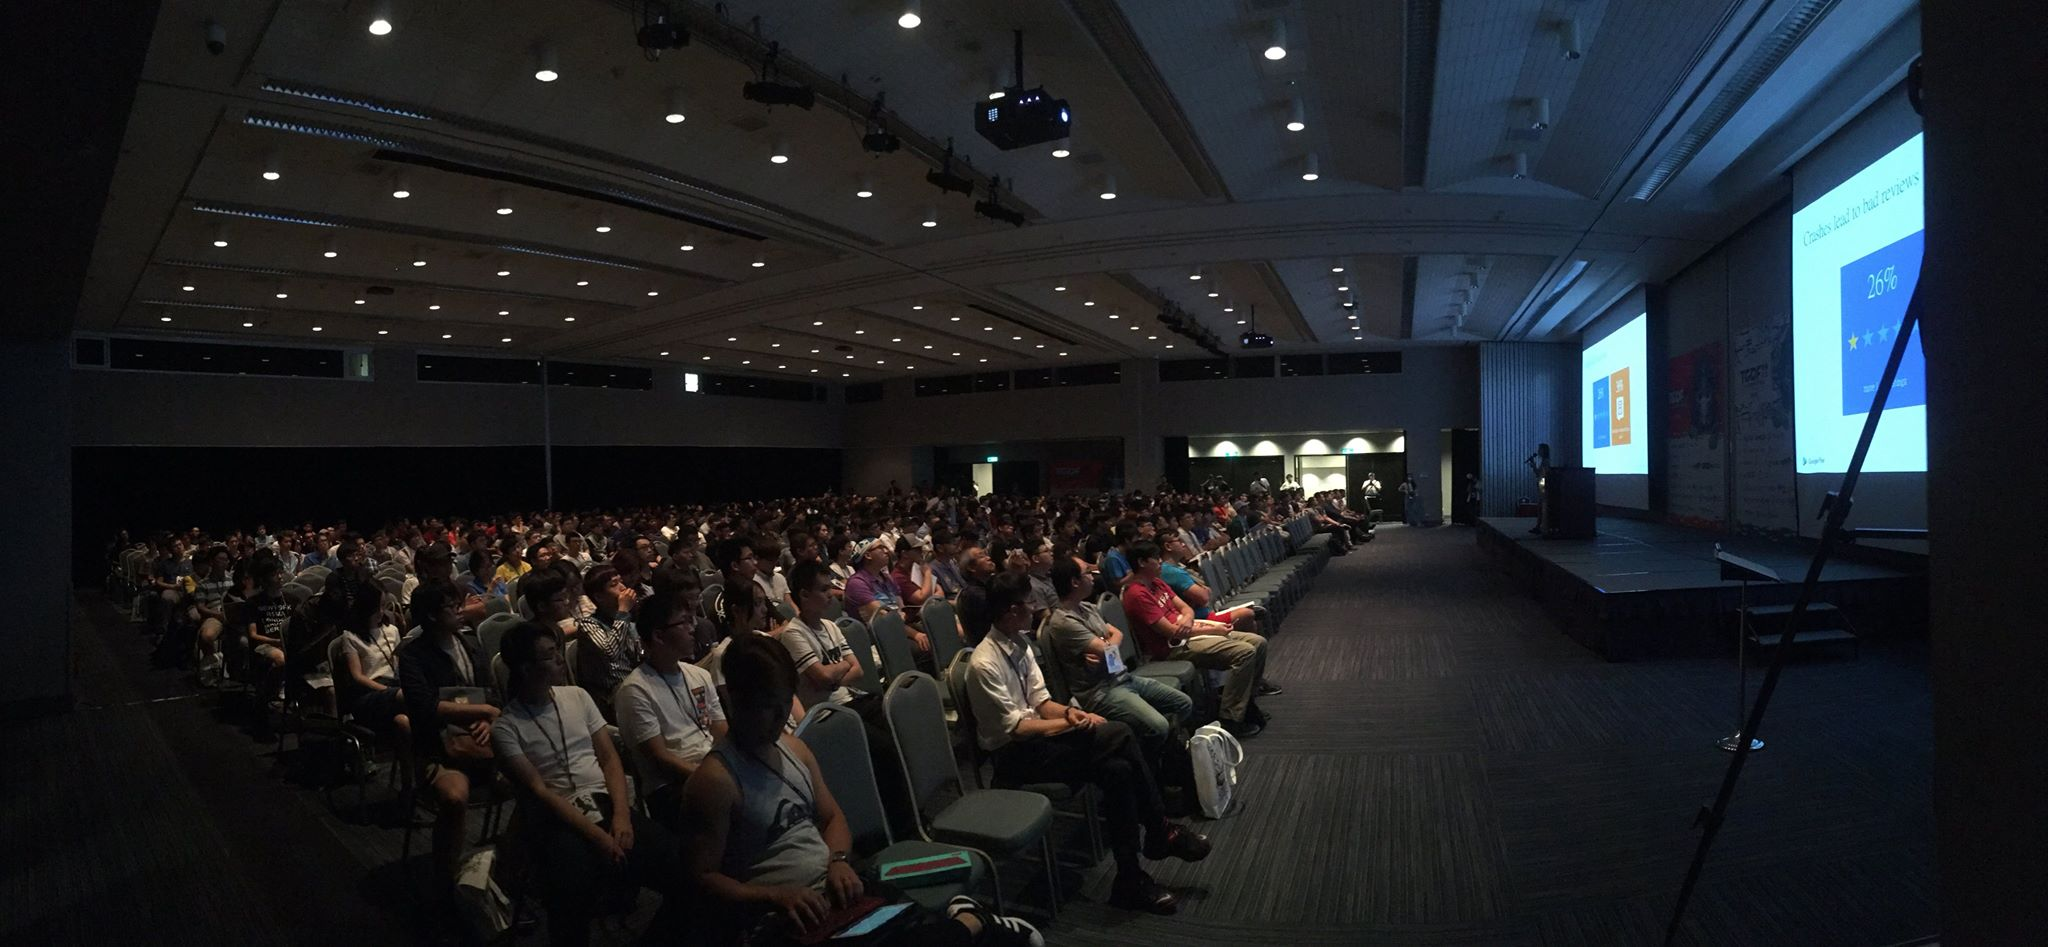 [2018TGDF]近千名國內外開發者共襄盛舉,五軌議程共超過20組講師精彩分享